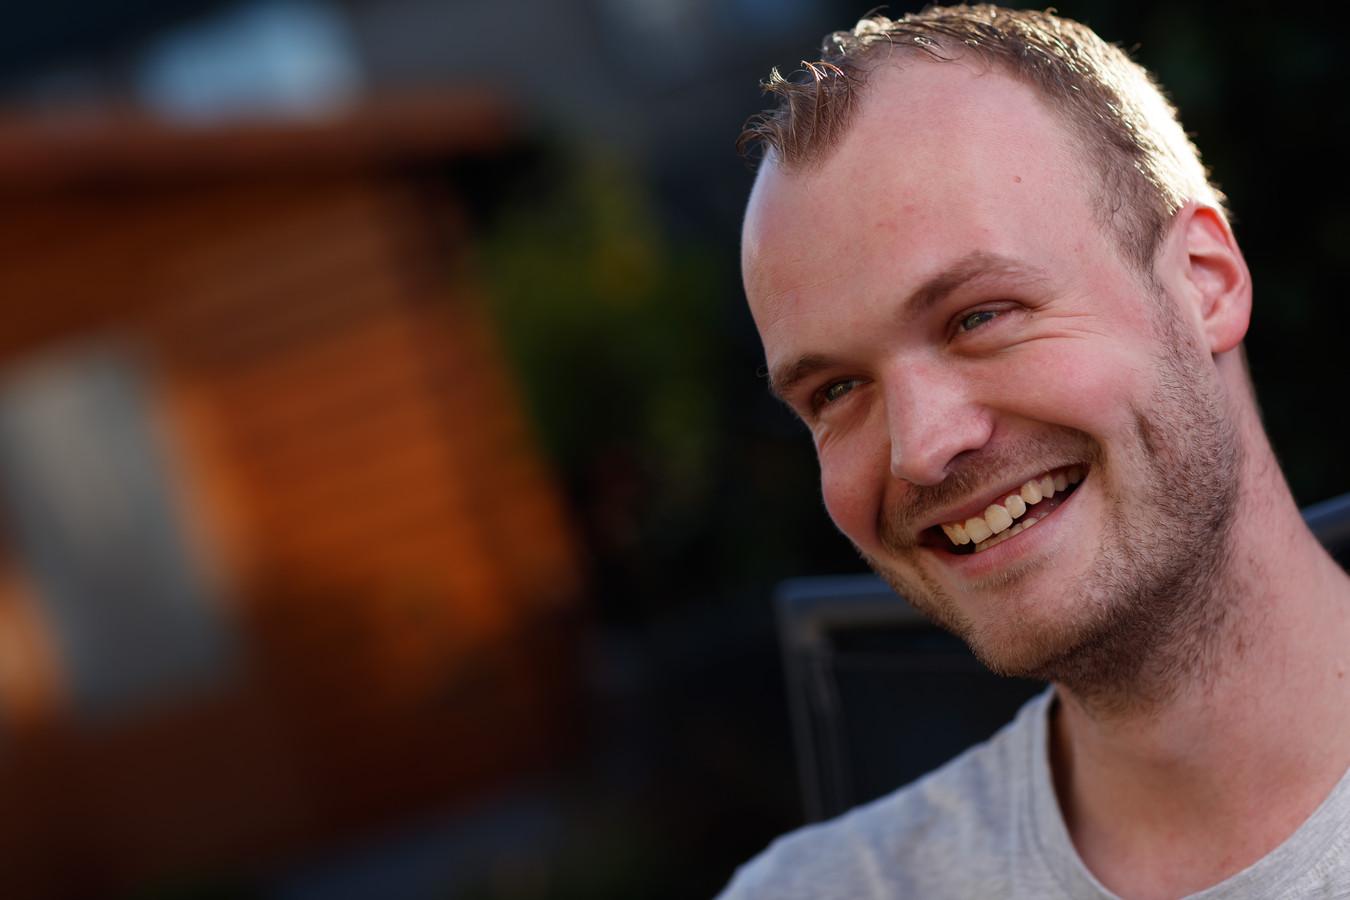 Boer zoekt Vrouw-deelnemer Kevin Rademaker uit Oud Gastel. FOTO MARCEL OTTERSPEER